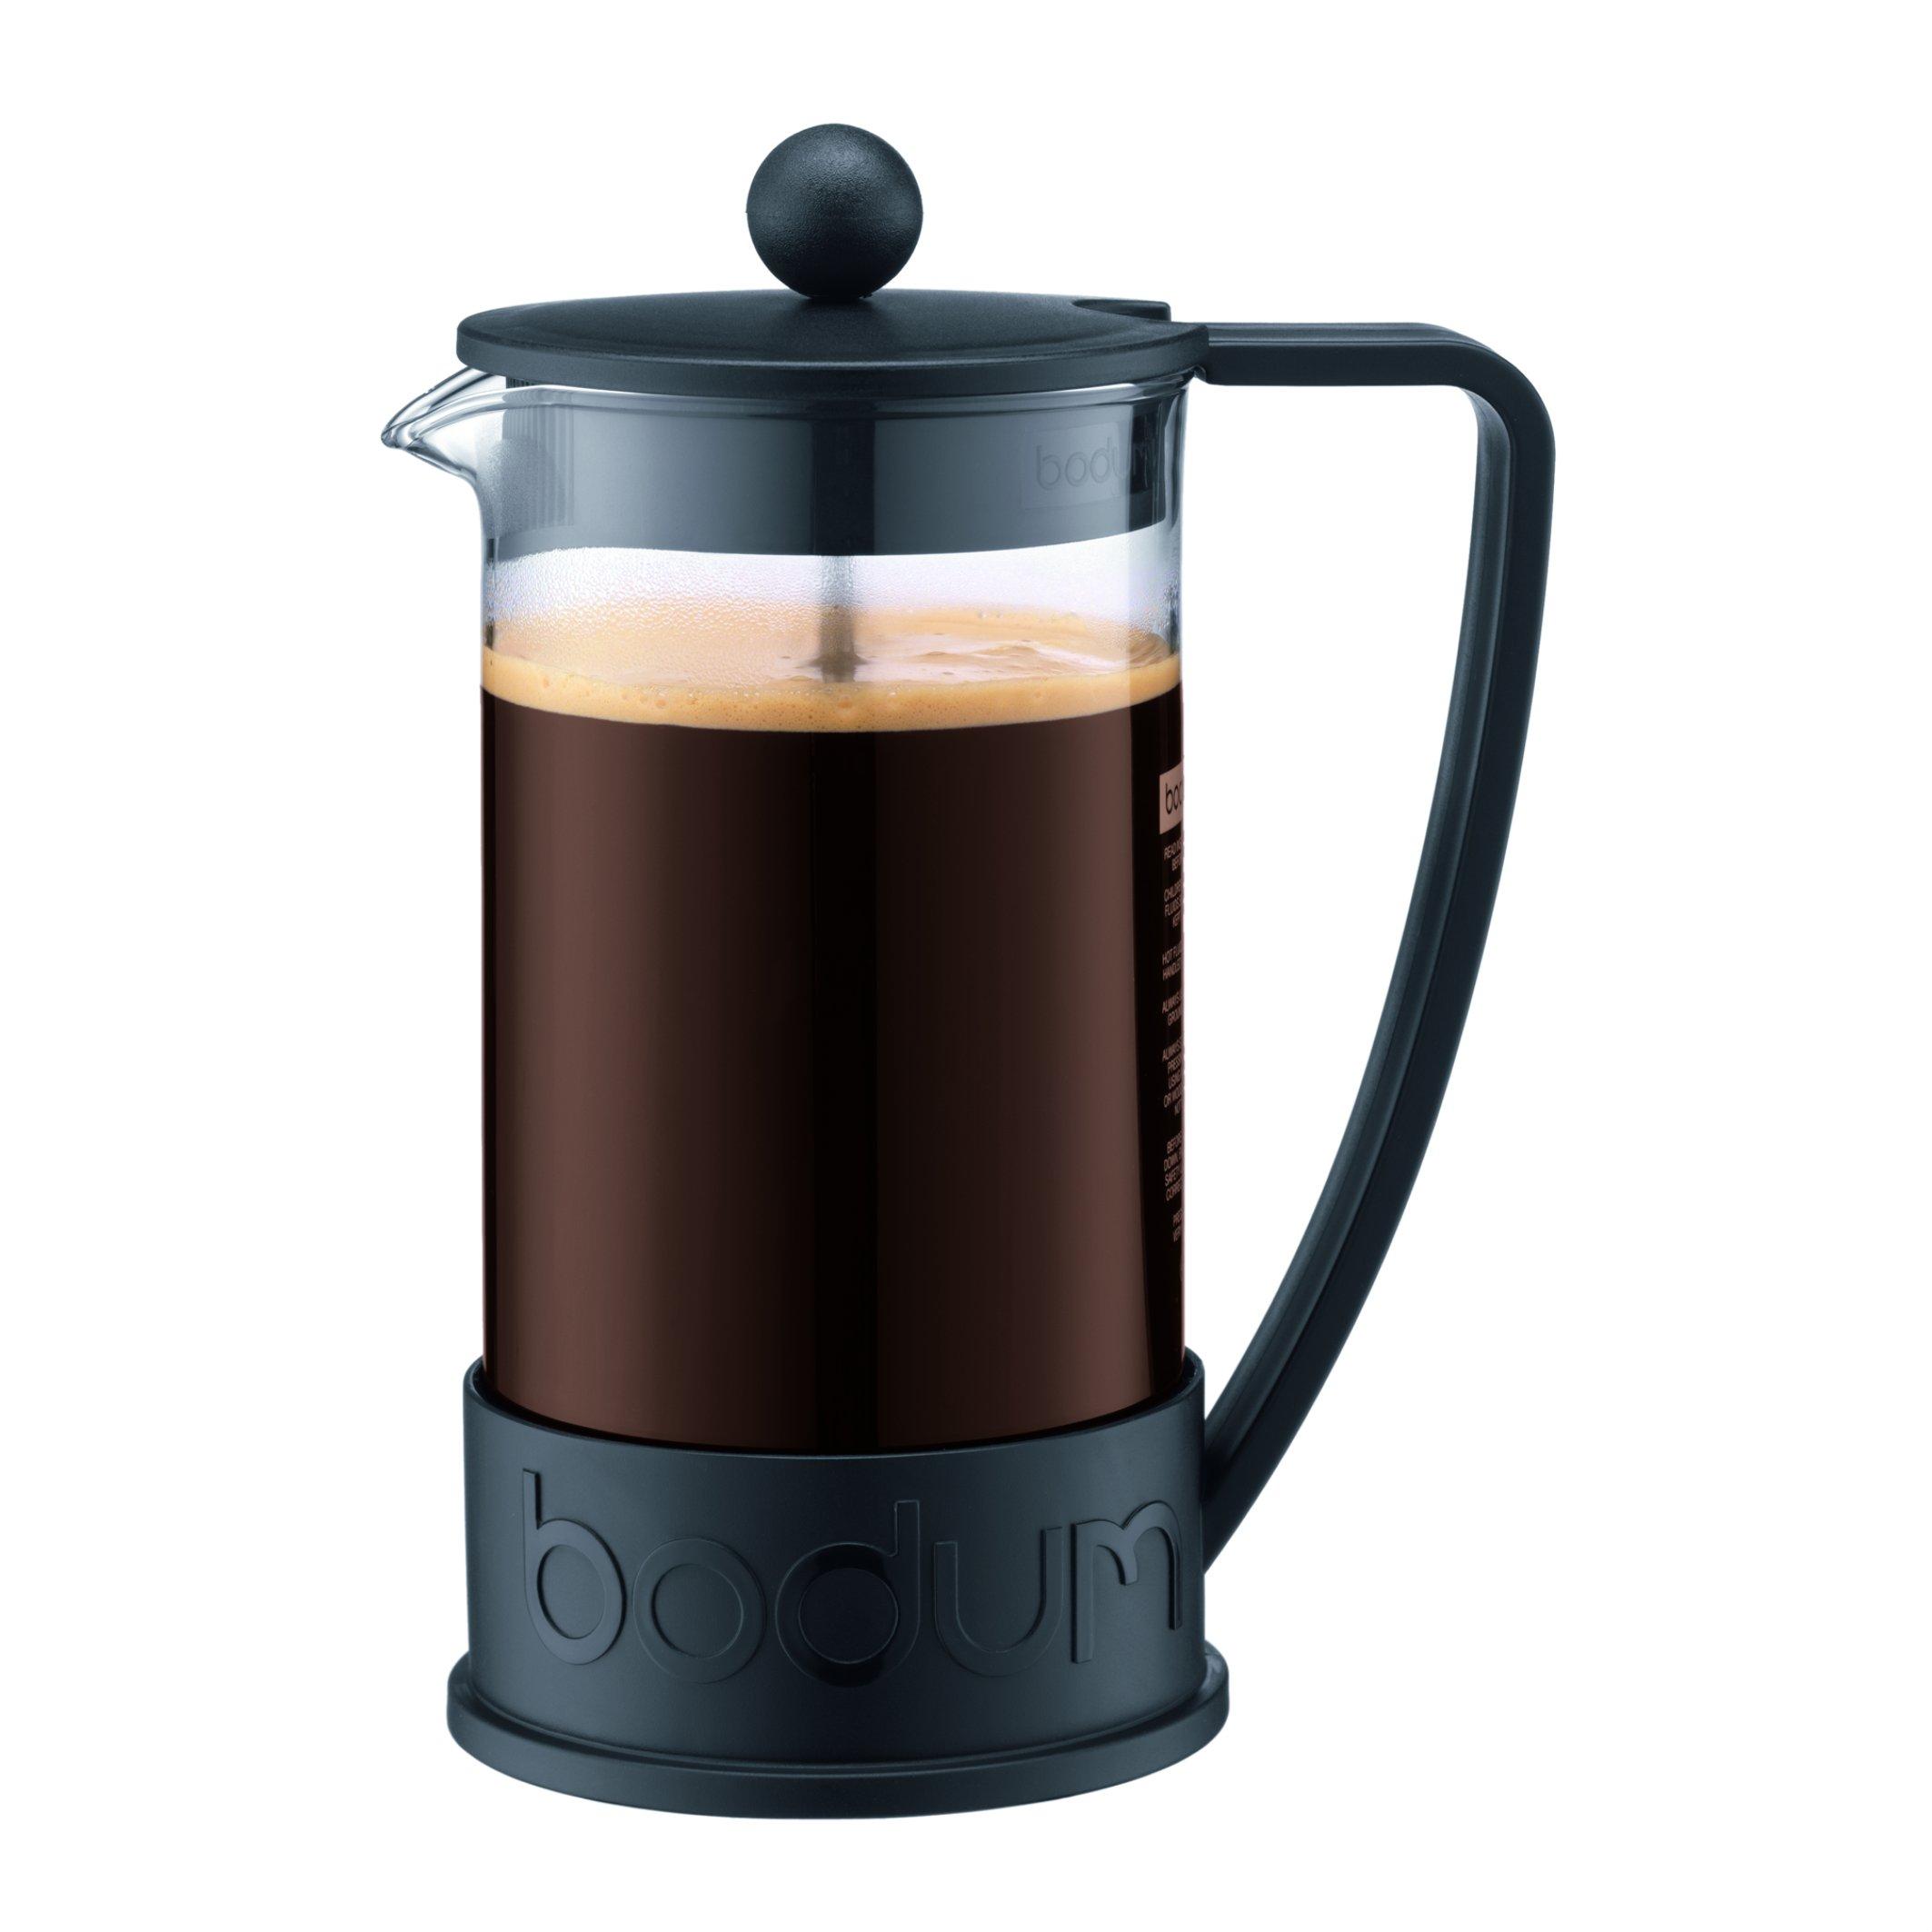 Bodum 10938-01B Brazil French Press Coffee and Tea Maker, 34 Ounce, Black by Bodum